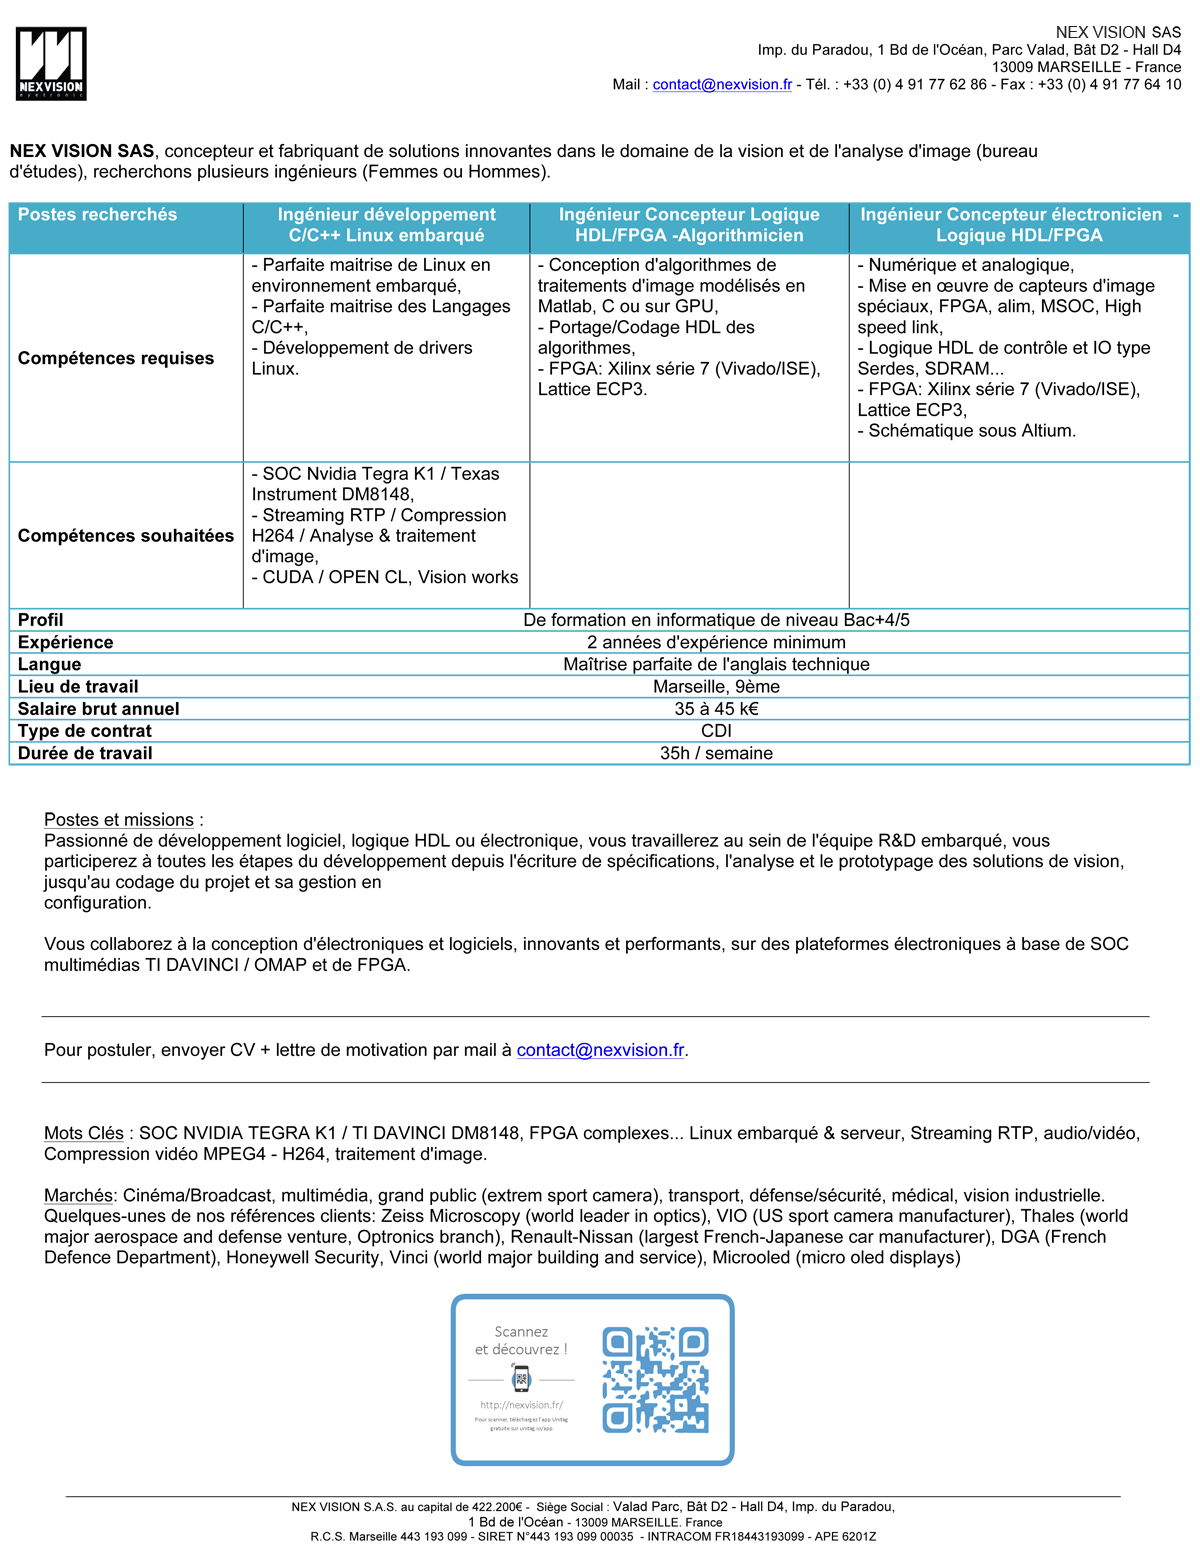 Offres emploi postes ingénieurs oct 2014